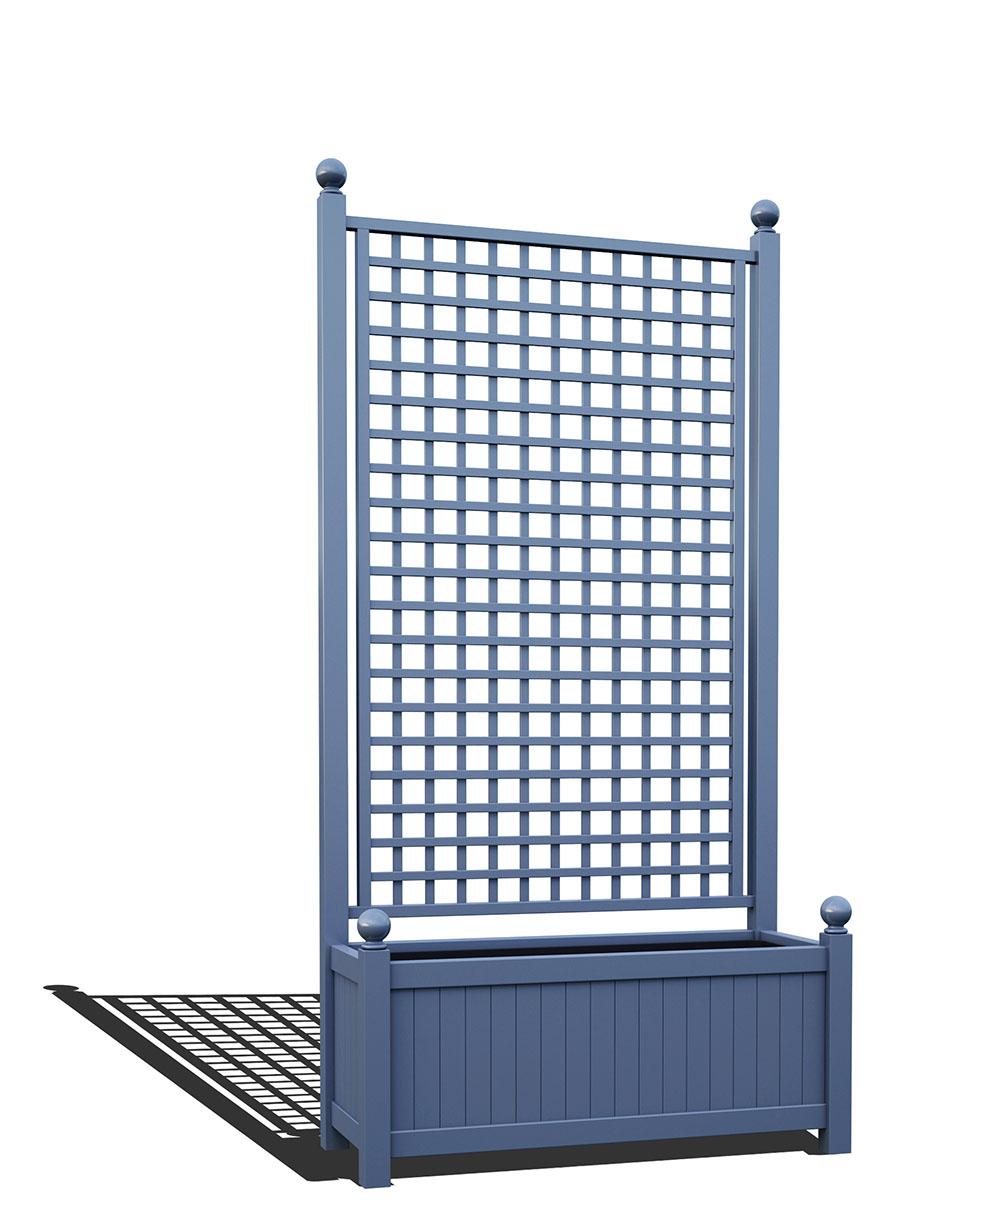 R17-A-SHD-Langer Metall Pflanzkübel mit integriertem Rankgitter in RAL 5014 pigeon blue